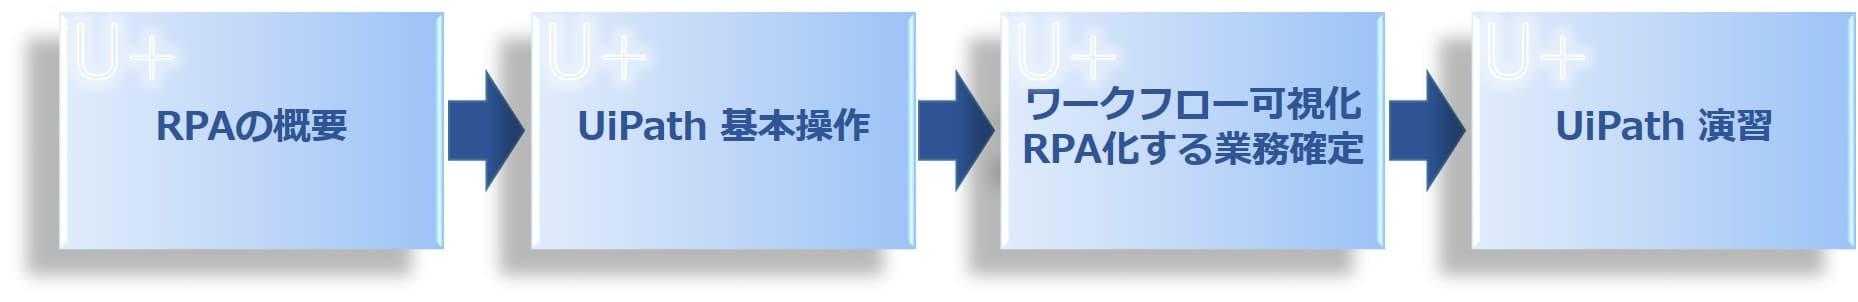 UiPath 公式速習プログラム 入門編の流れ